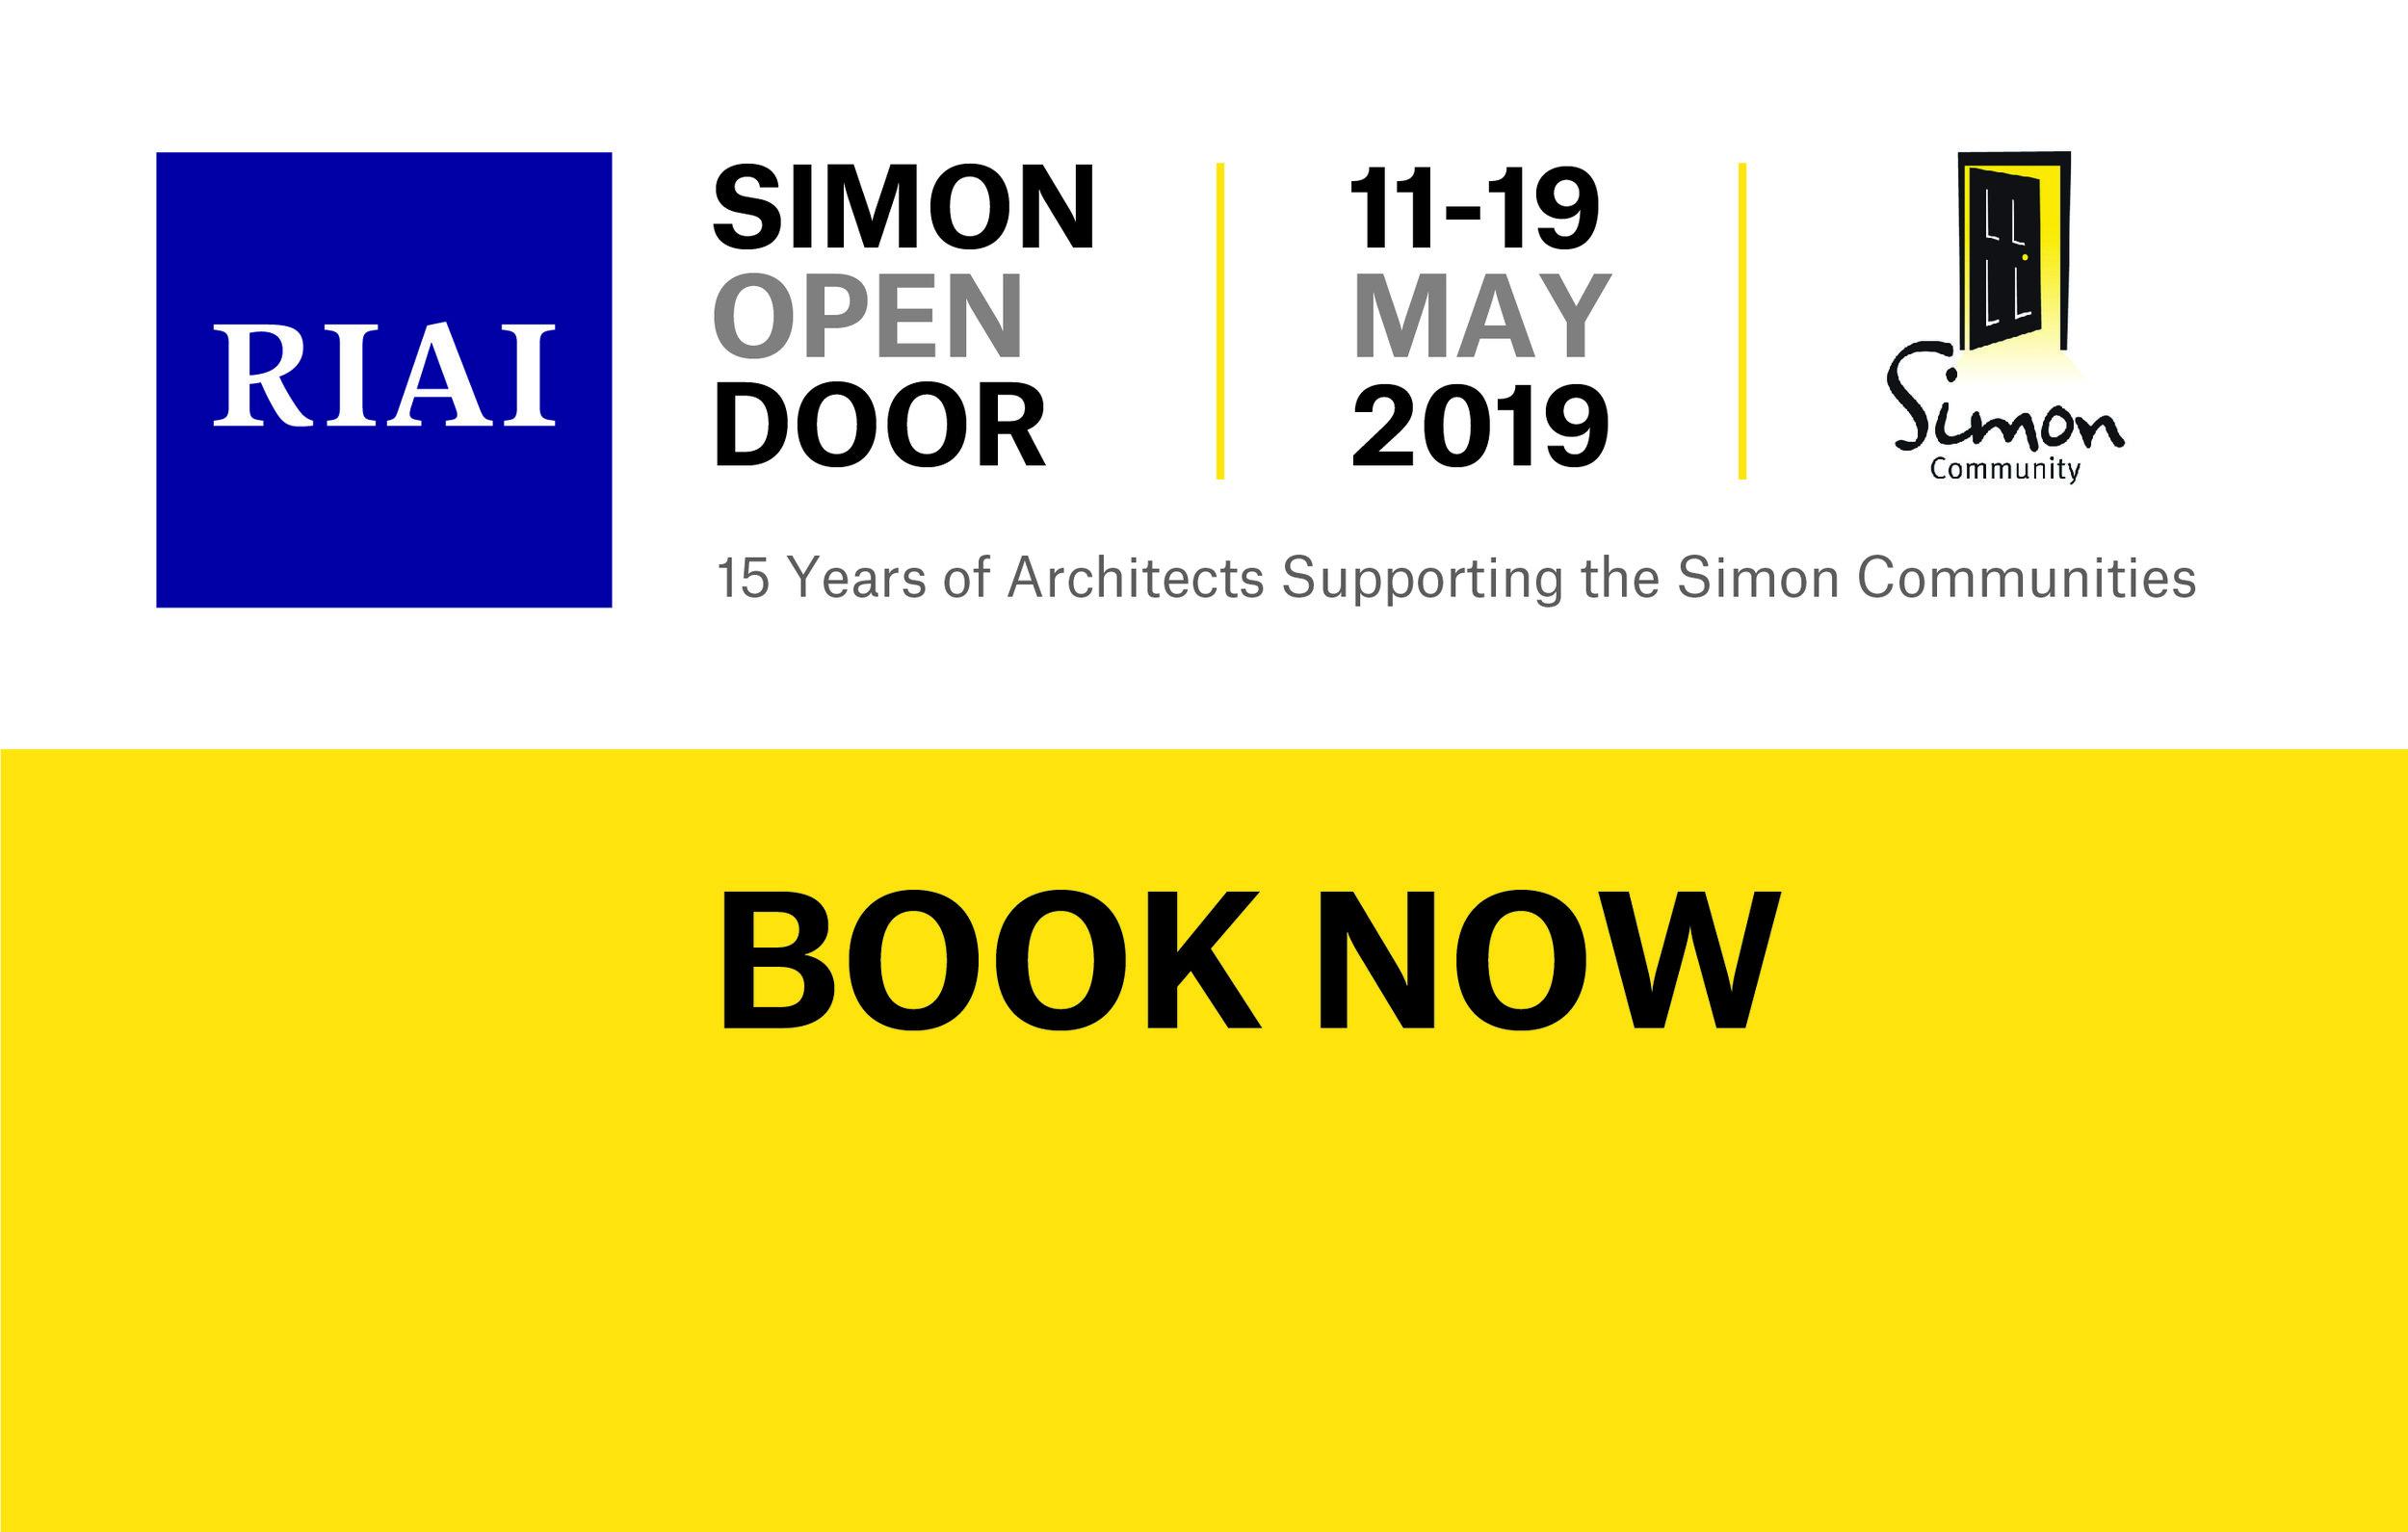 RIAI_Simon-Open-Door_BOOKING 2019_RAE MOORE ARCHITECT.jpg